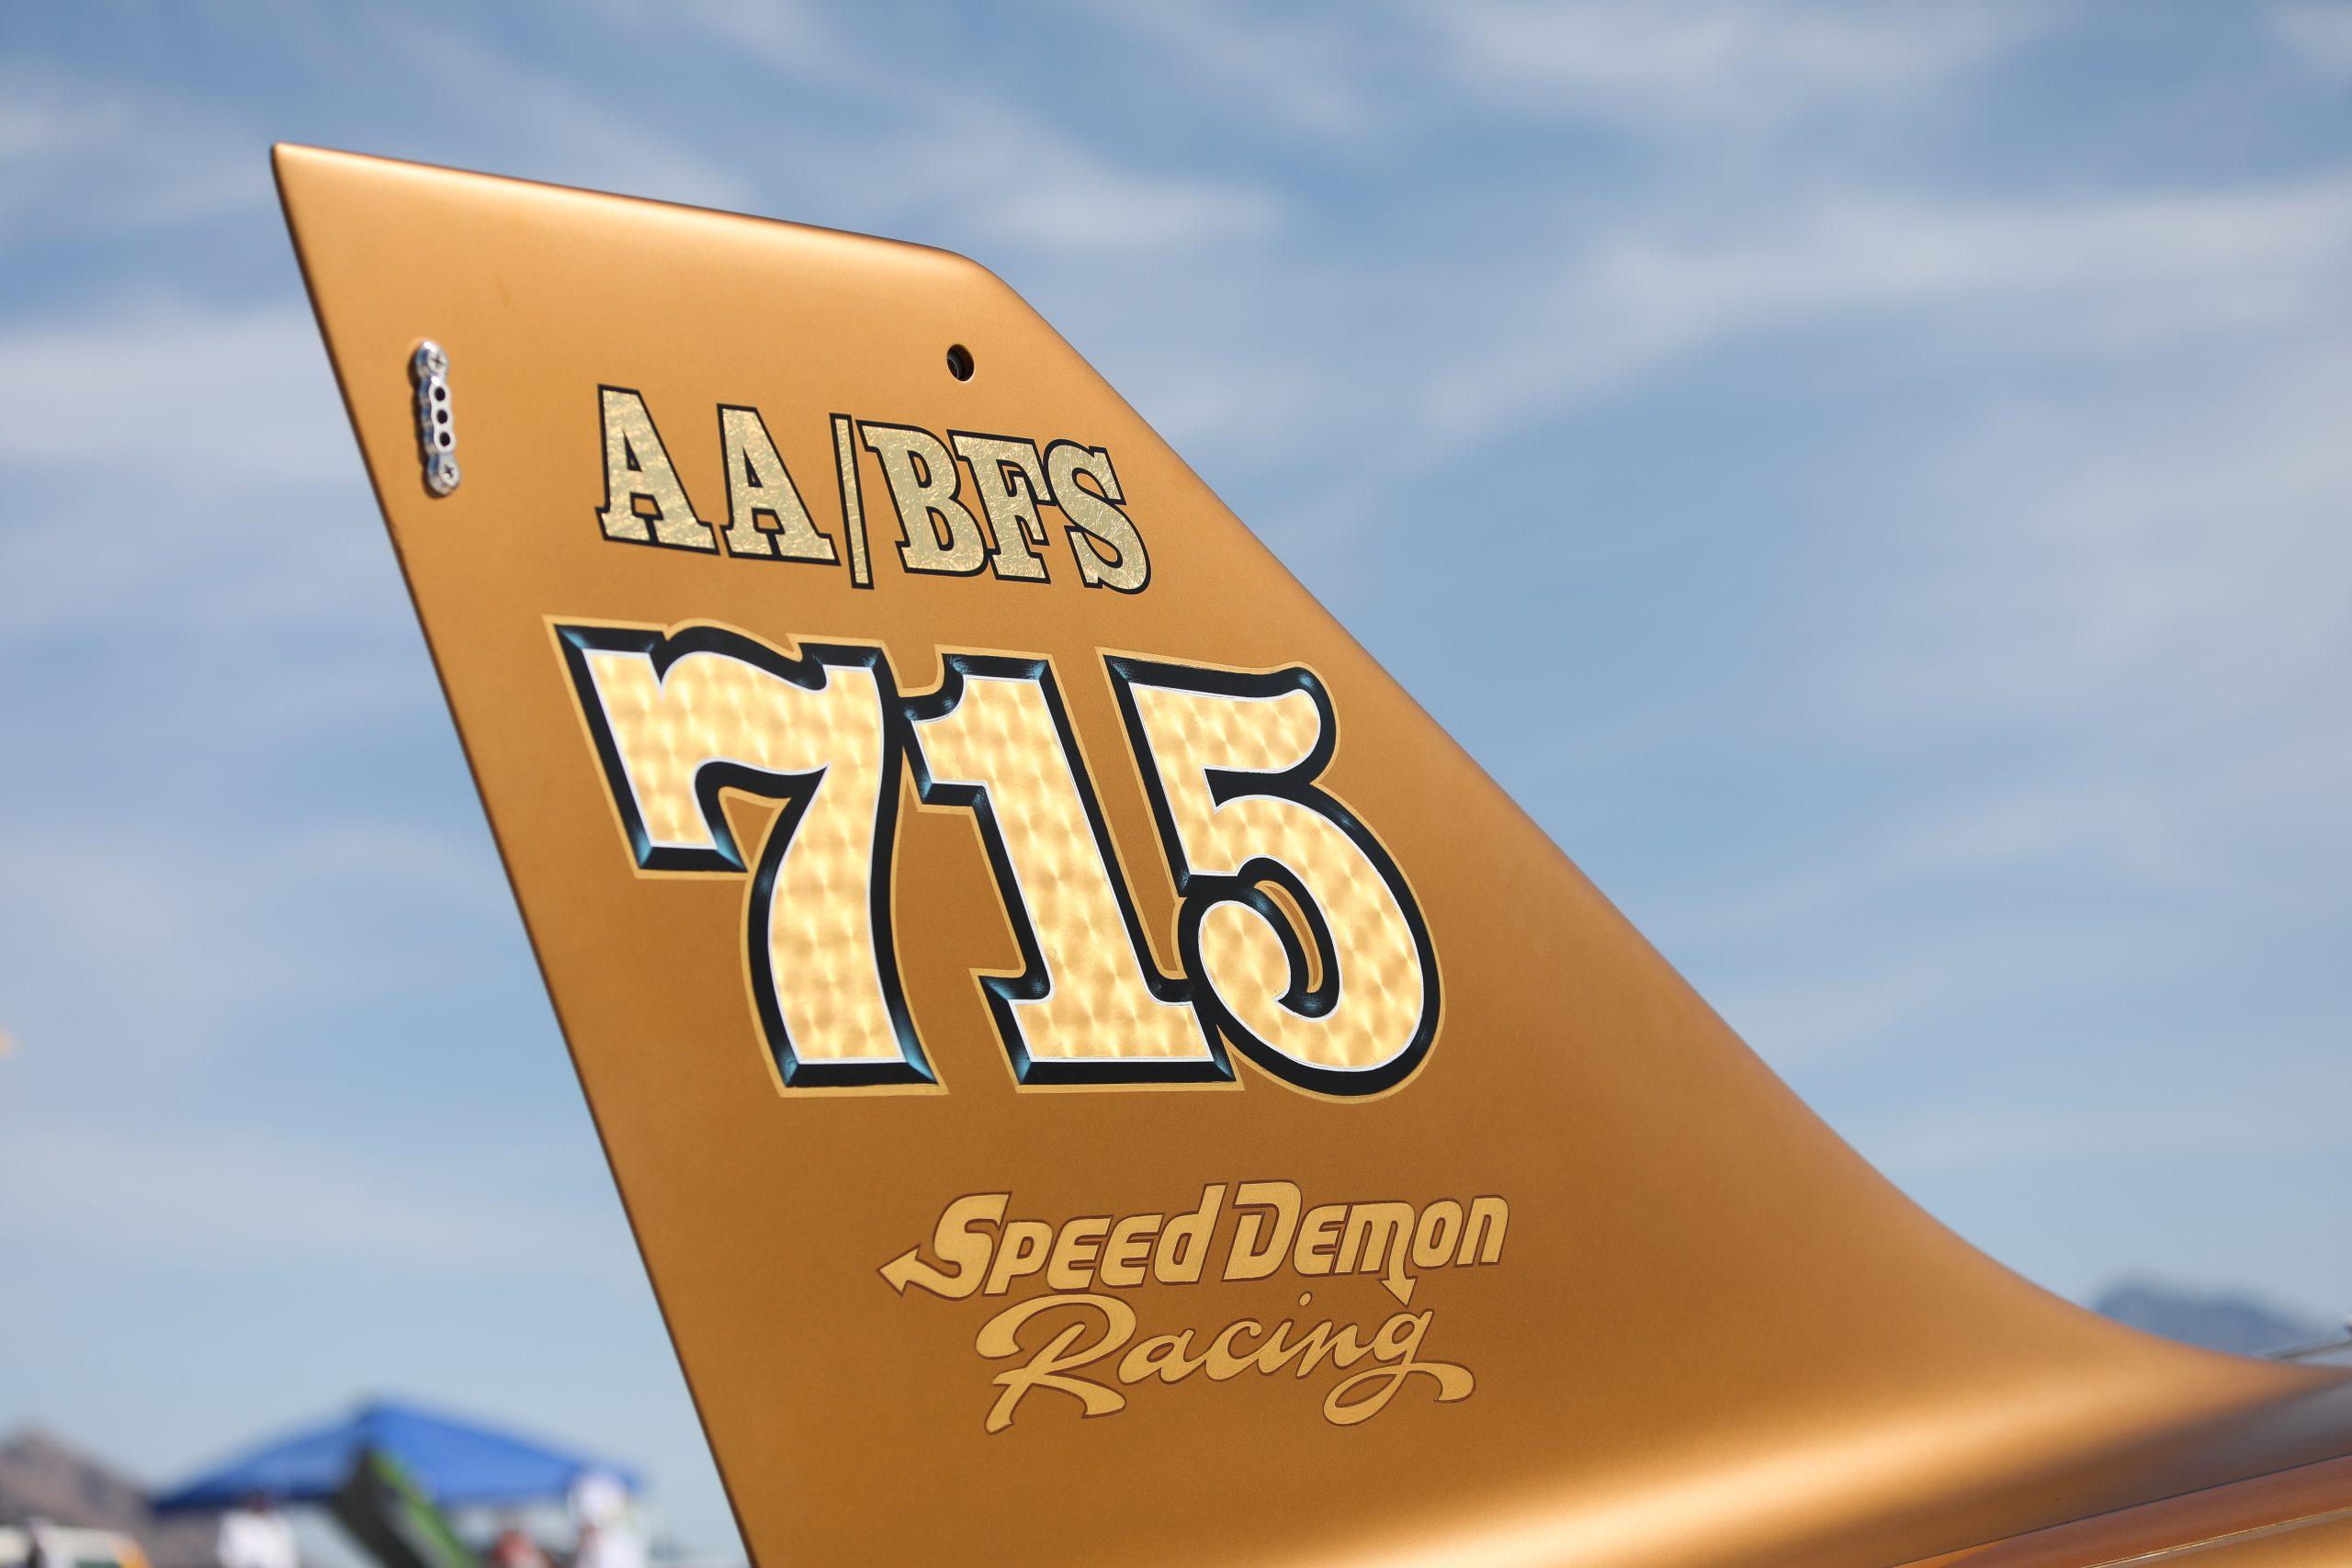 Speed Demon tail Bonneville Speed Week 2020